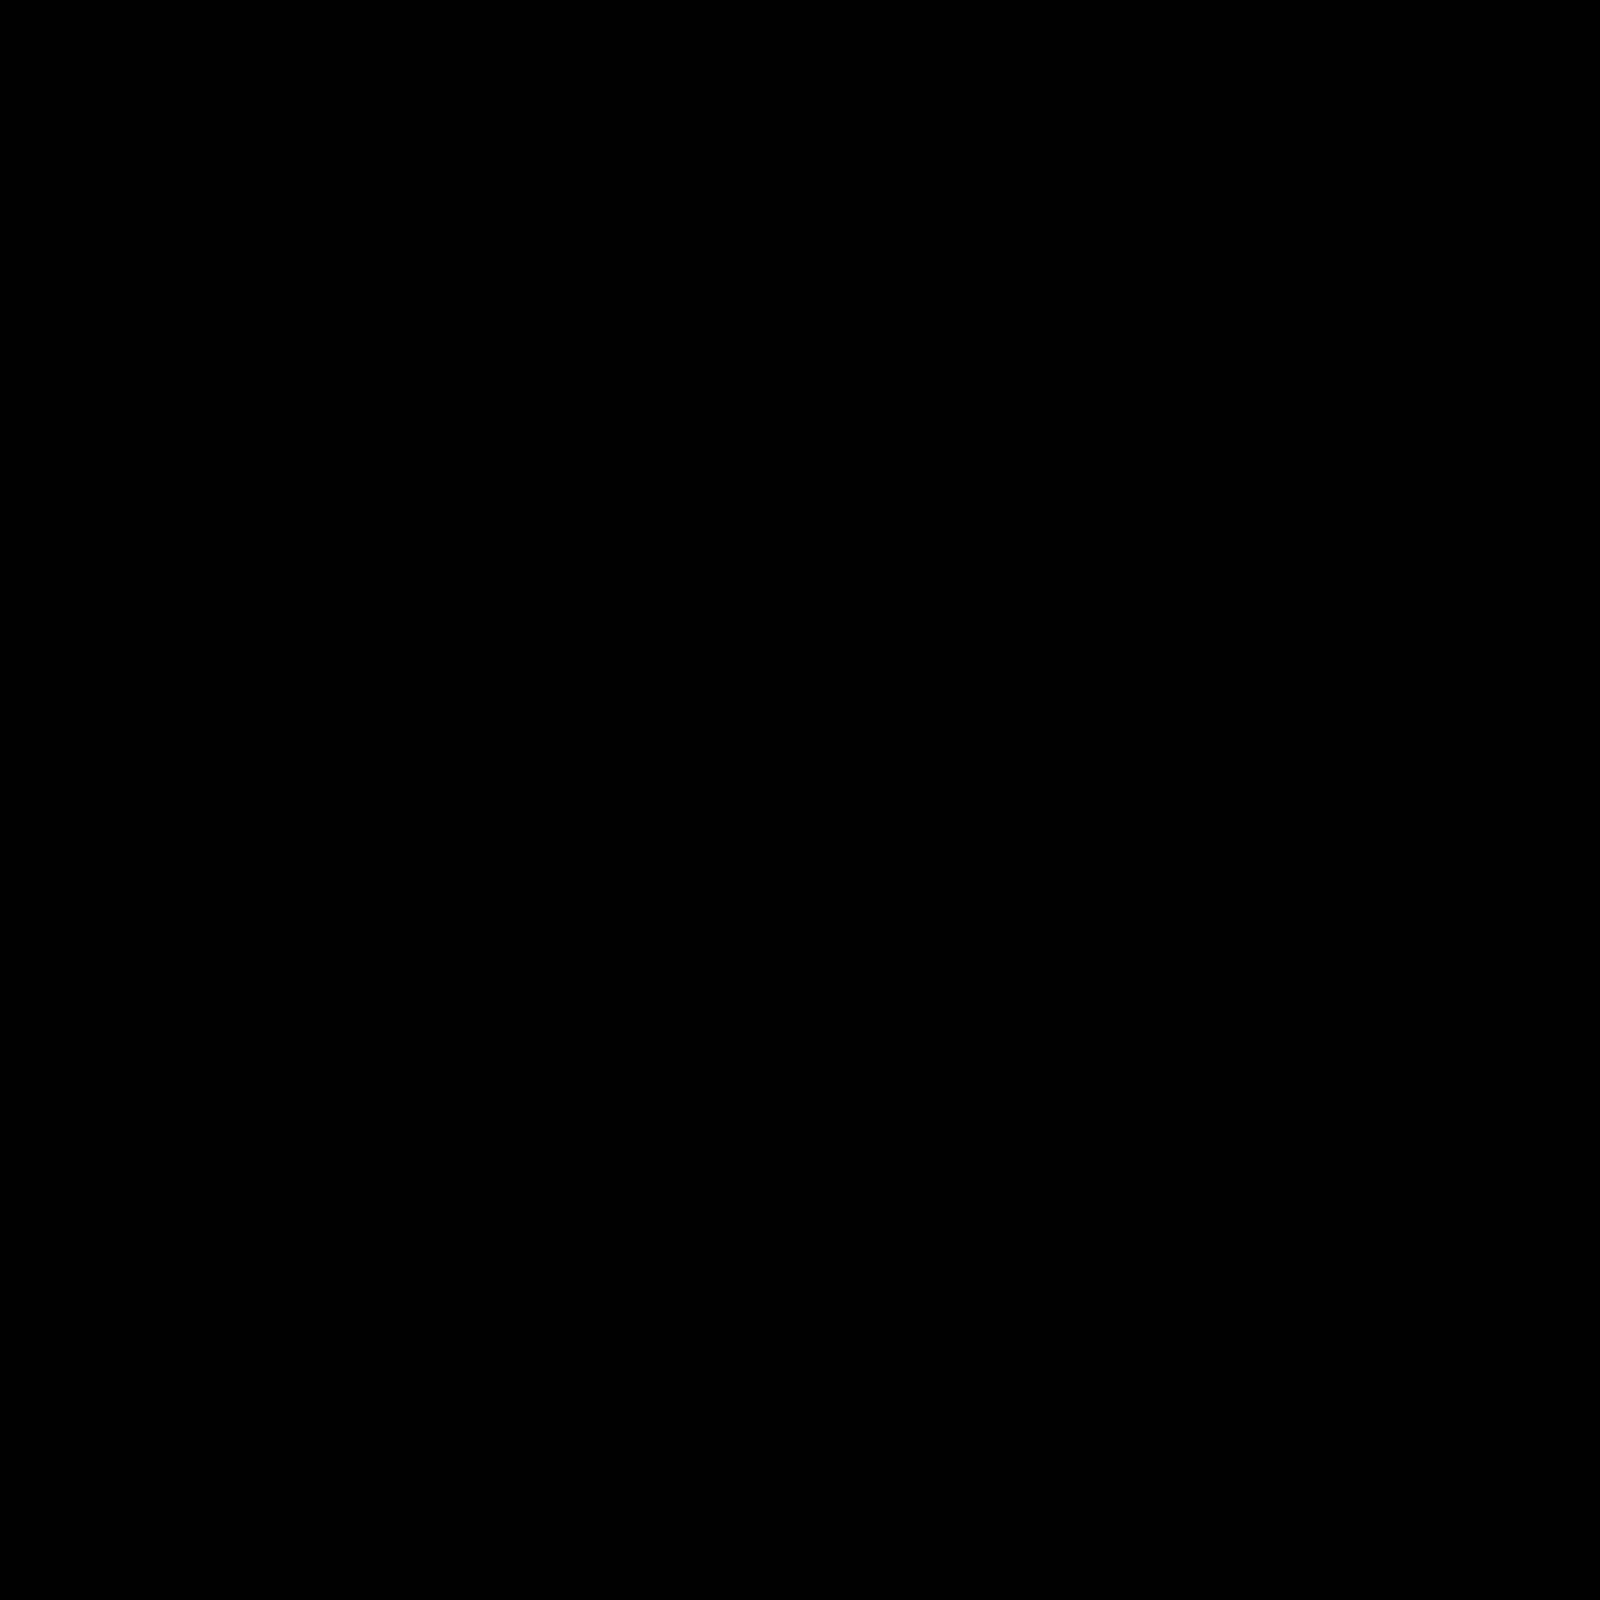 Flounder Fish icon